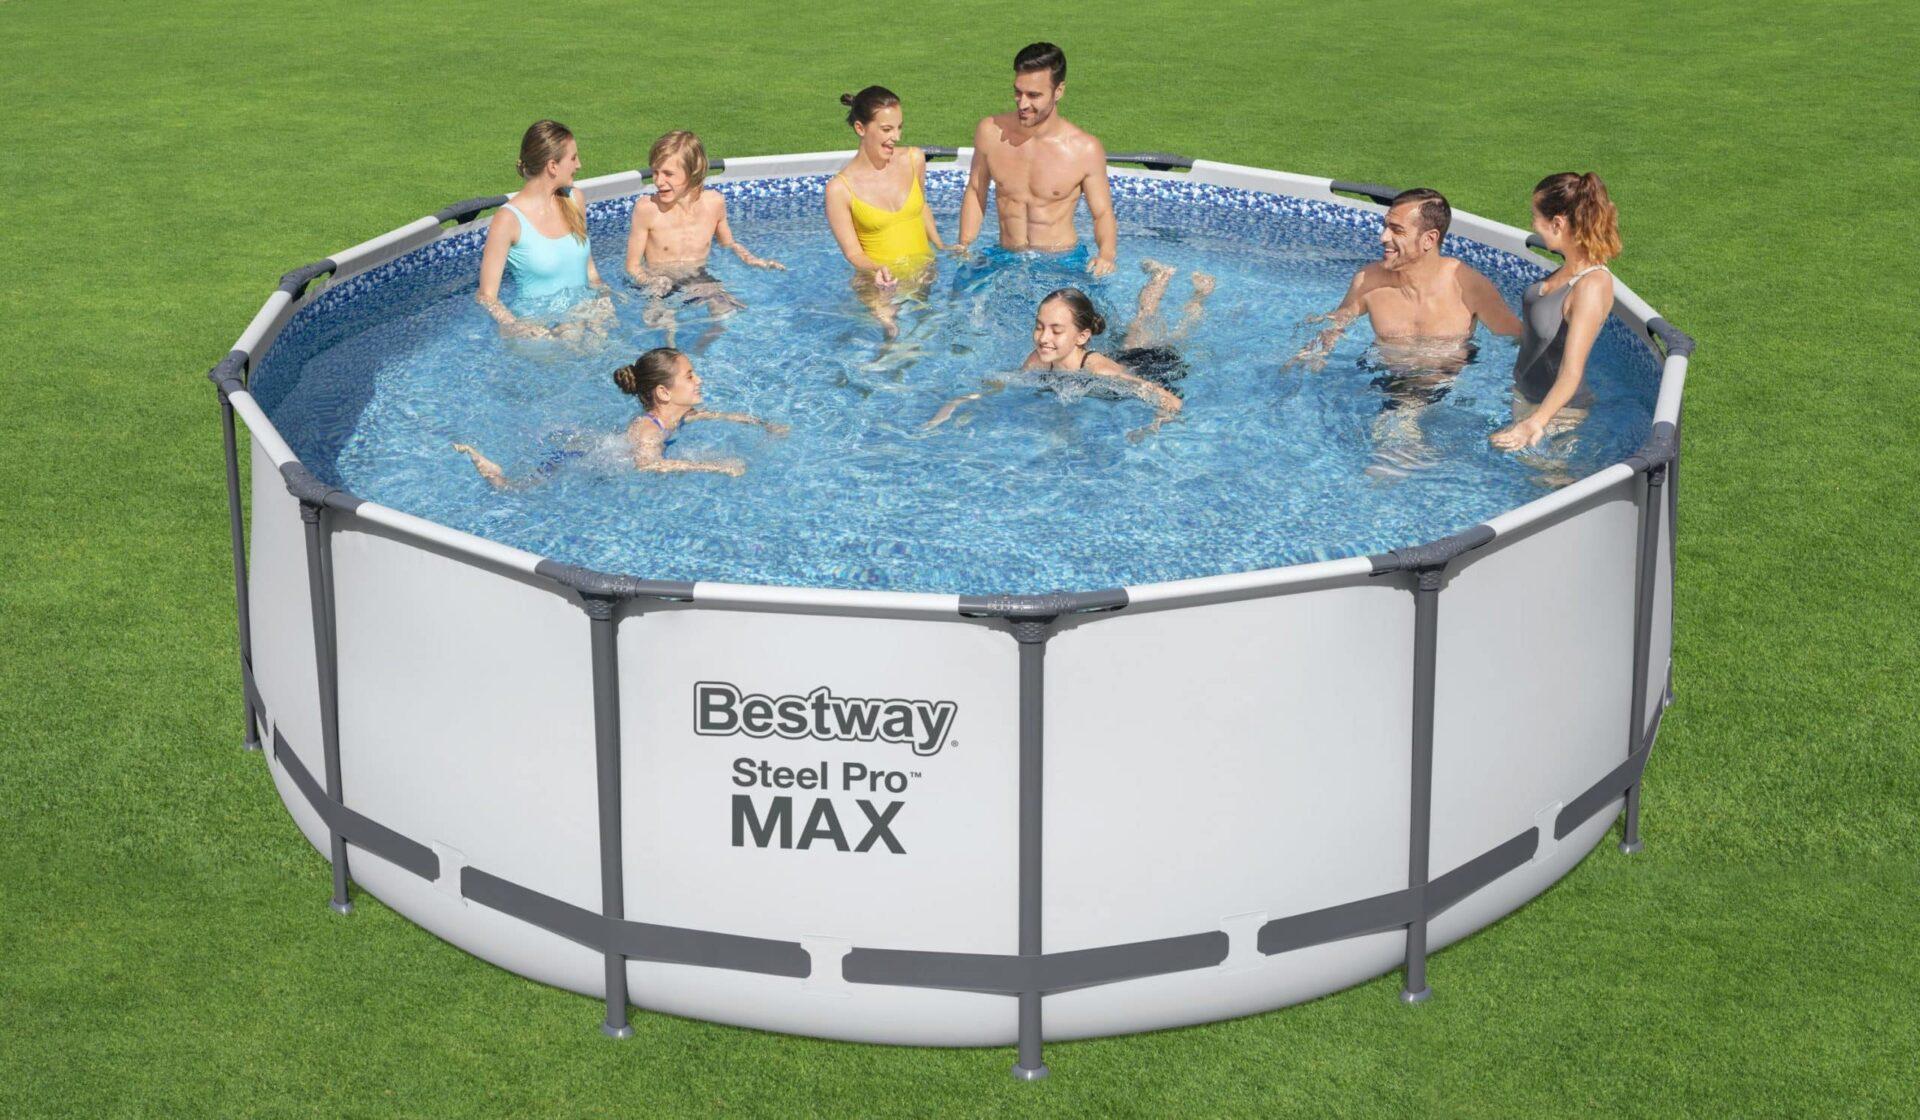 Rundt Steel Pro MAX Q1 bassengsett familie Bestway